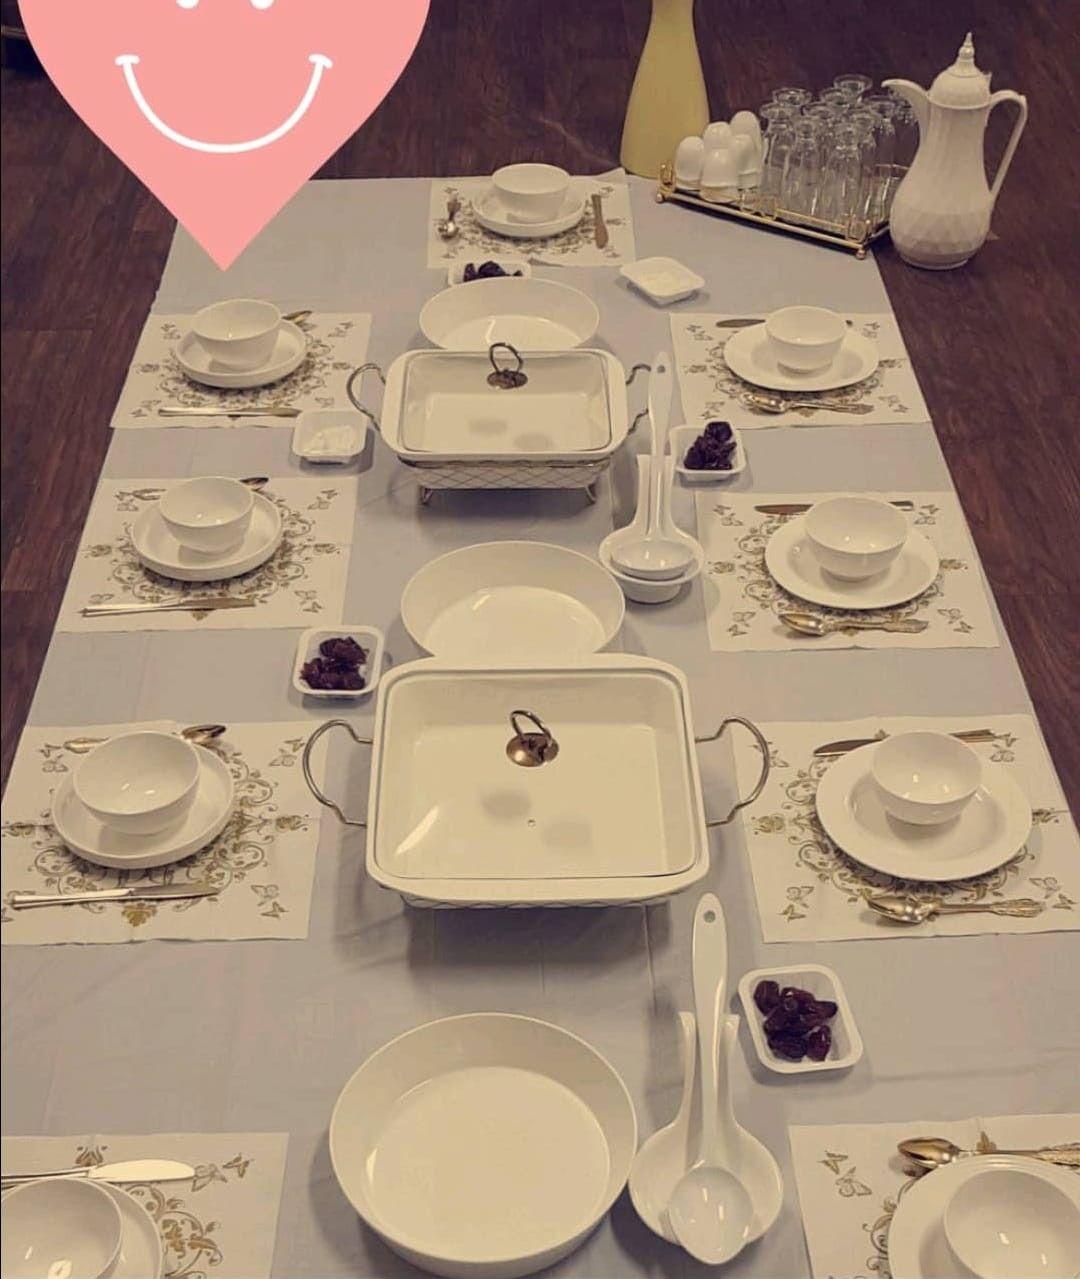 فكرة ترتيب السفره Dinning Table Decor Clay Crafts For Kids Food Decoration